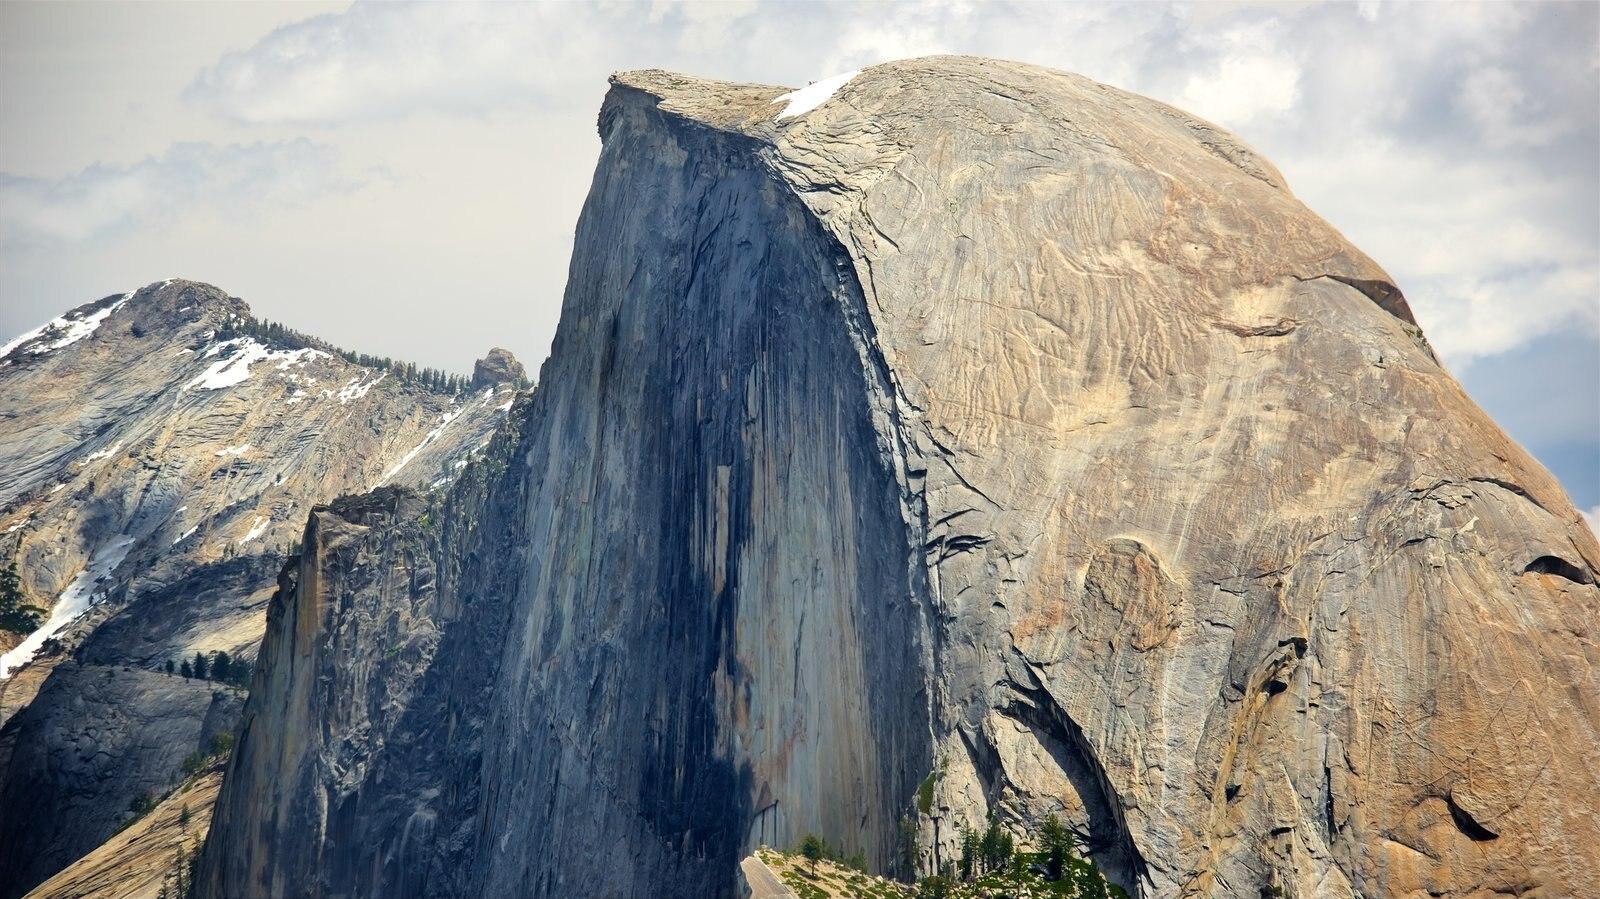 Glacier Point que inclui montanhas